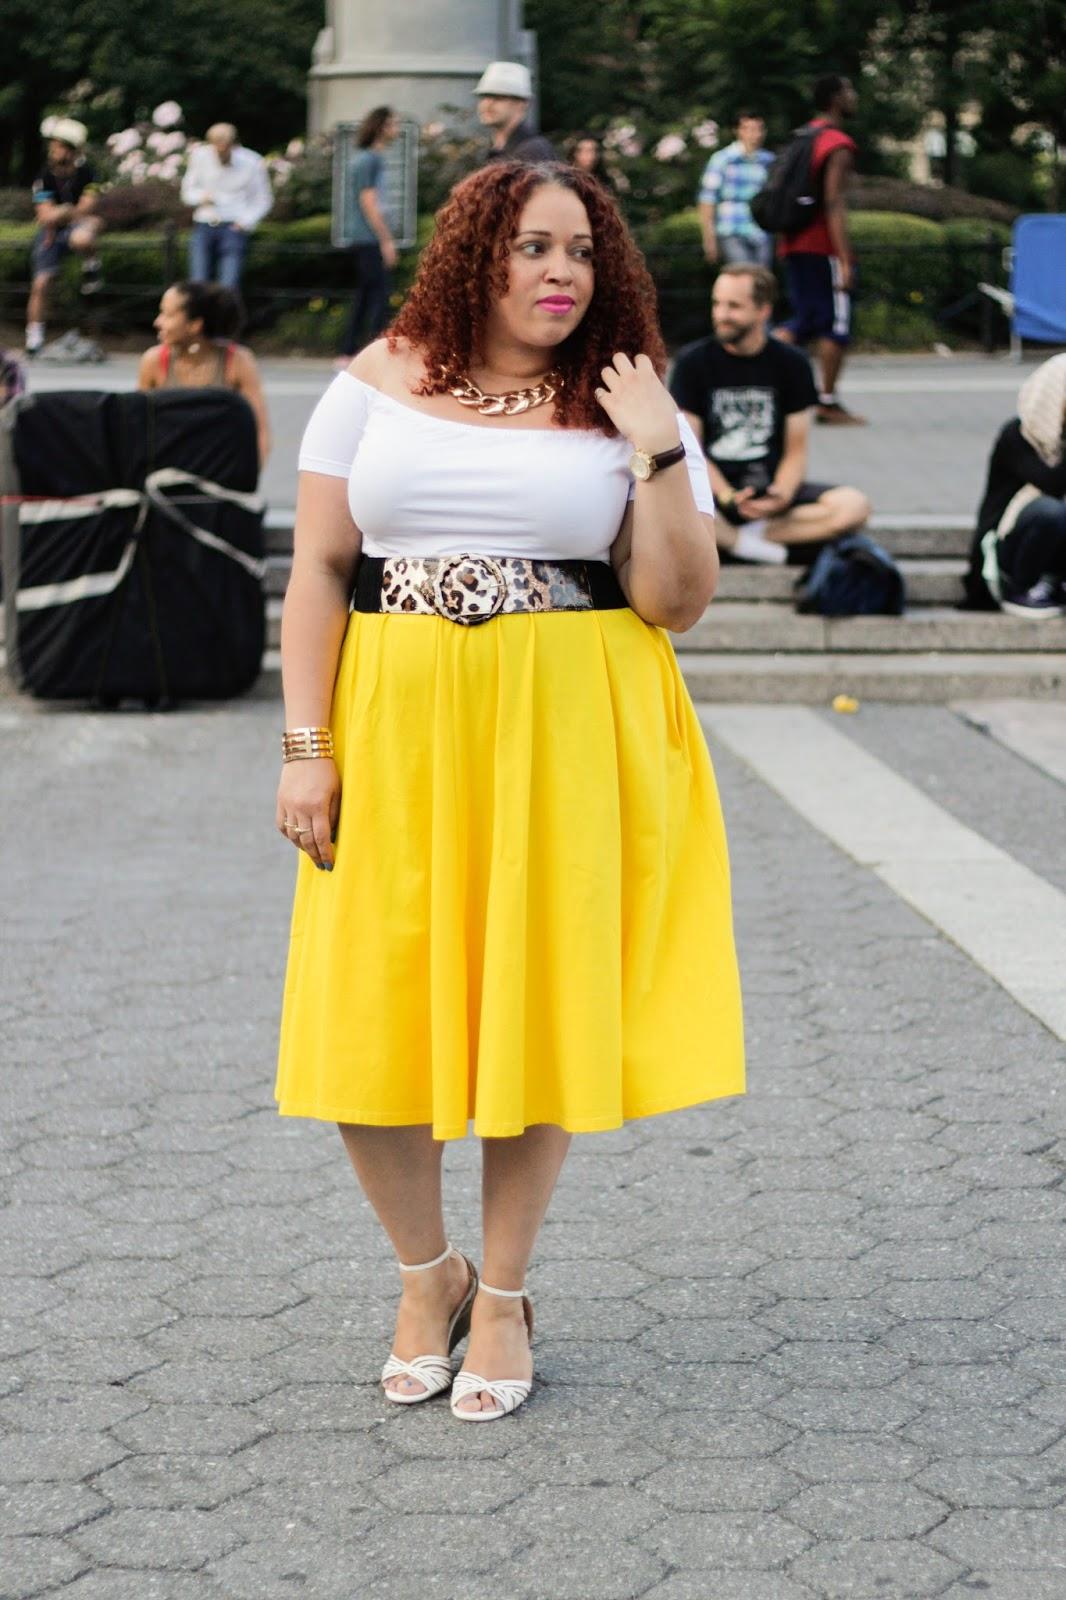 d697bb3025aac Top   Skirt (similar) - Rebdolls  Shoes - Payless  Belt - Torrid  Necklace    Bracelet c o Fashion to Figure